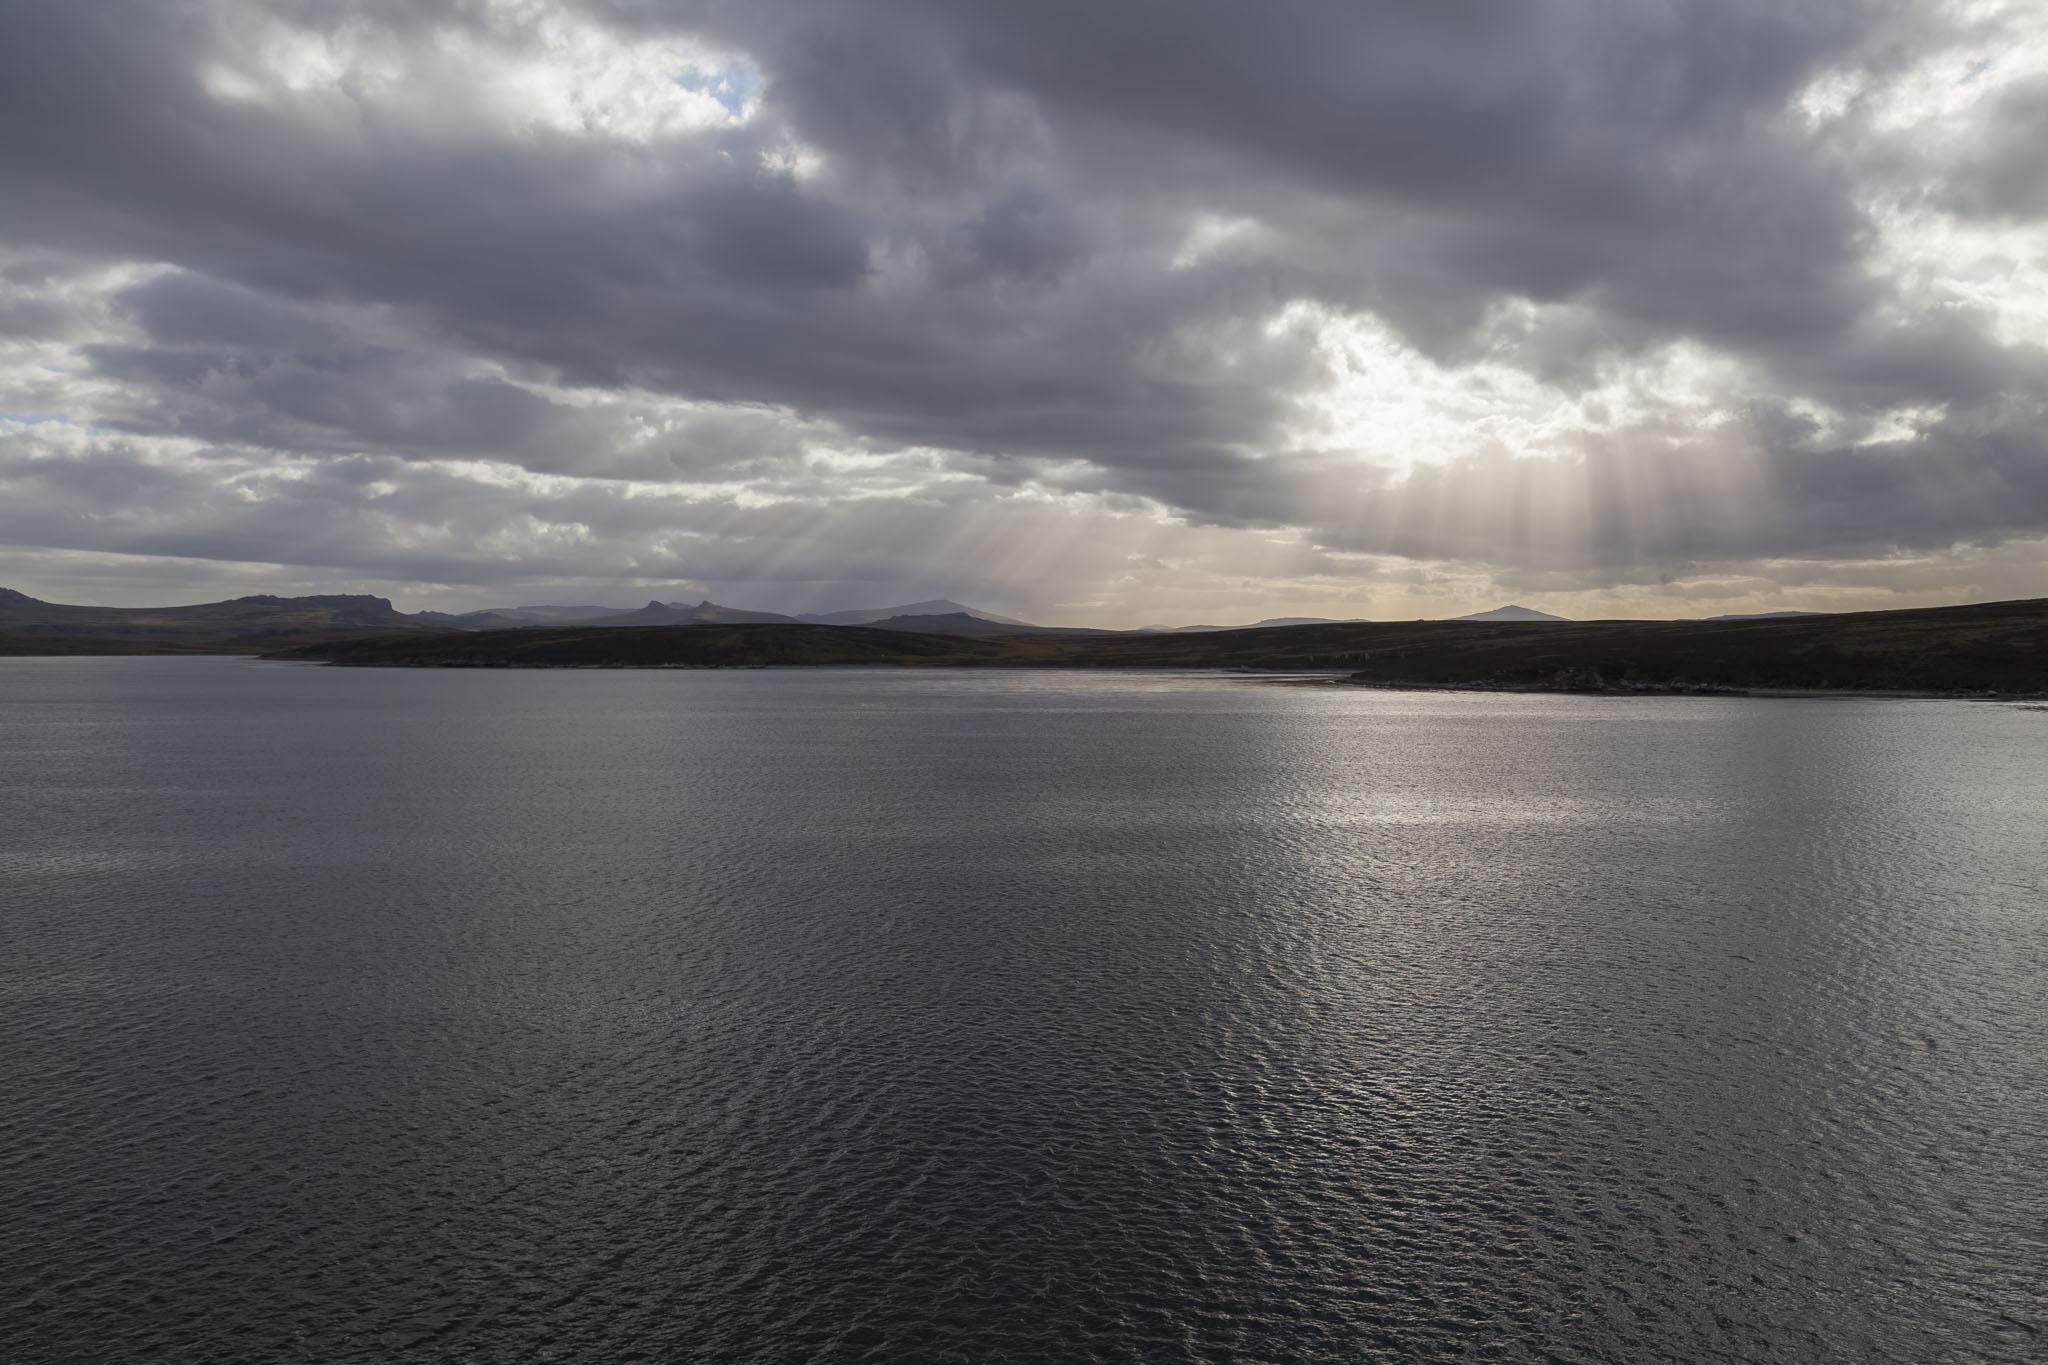 Sunbeams Through Clouds, Falkland Islands